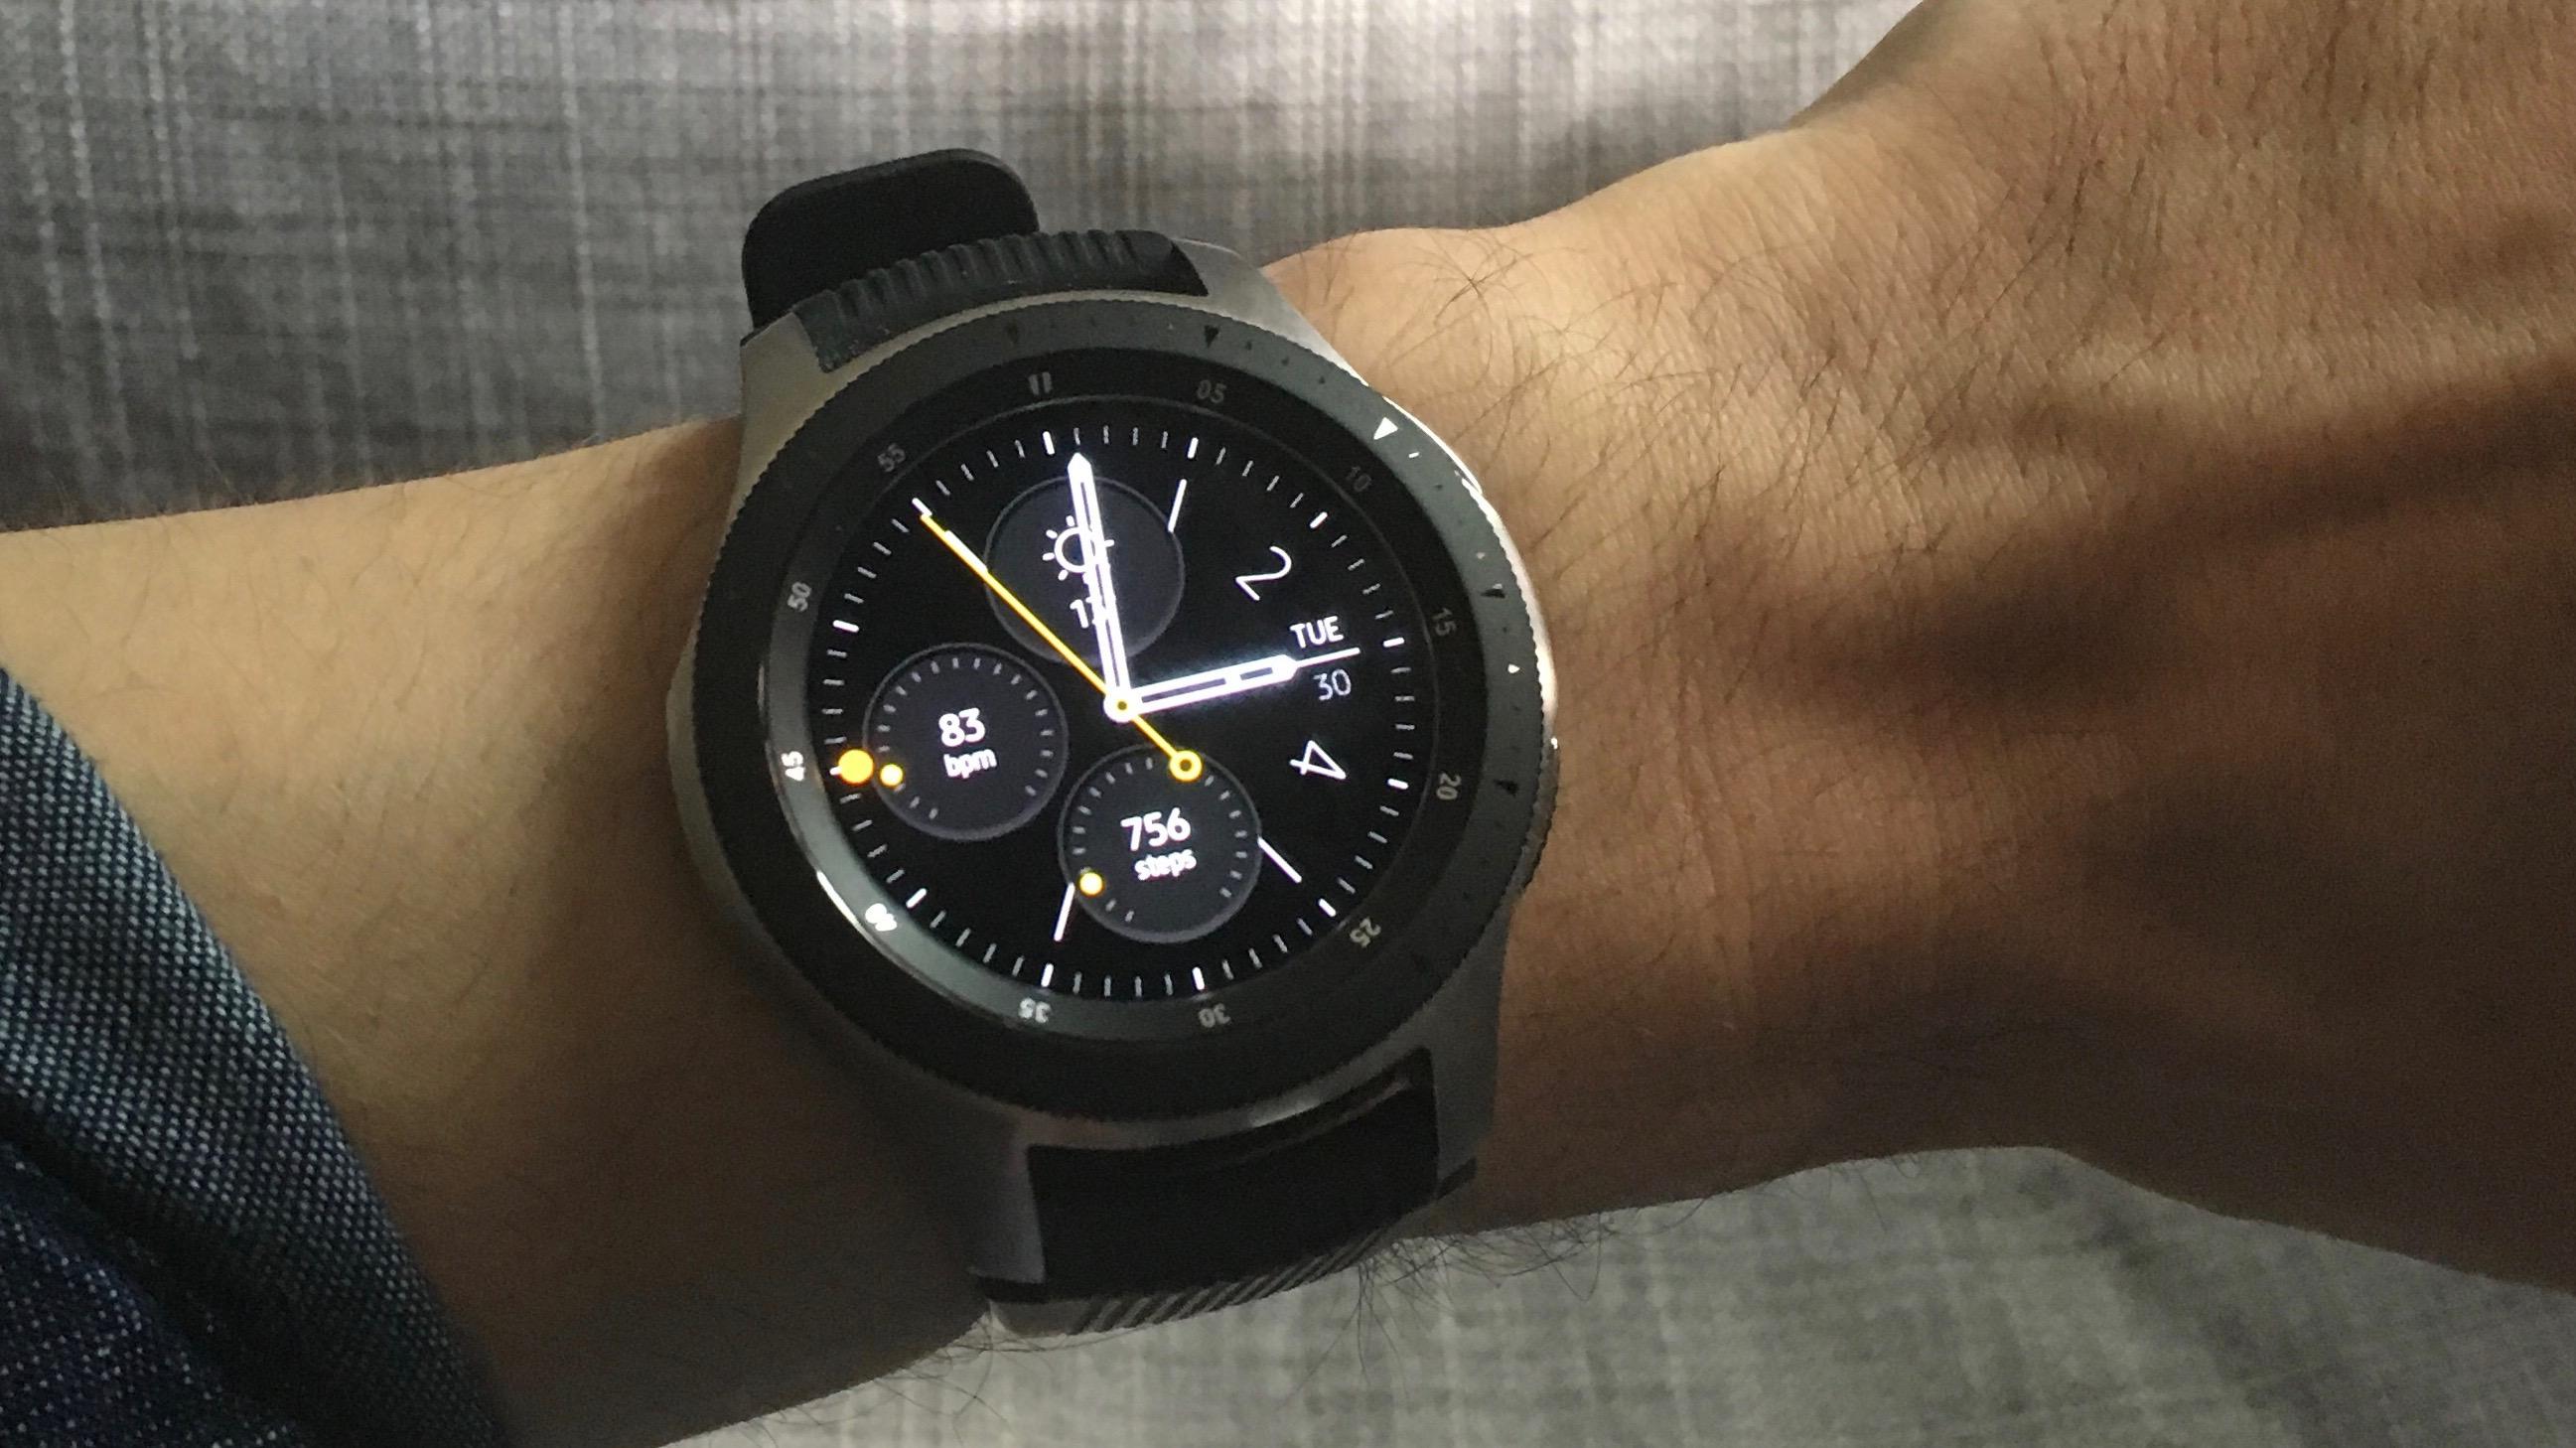 Samsung Gear S3/Galaxy Watch + iPhone 5S